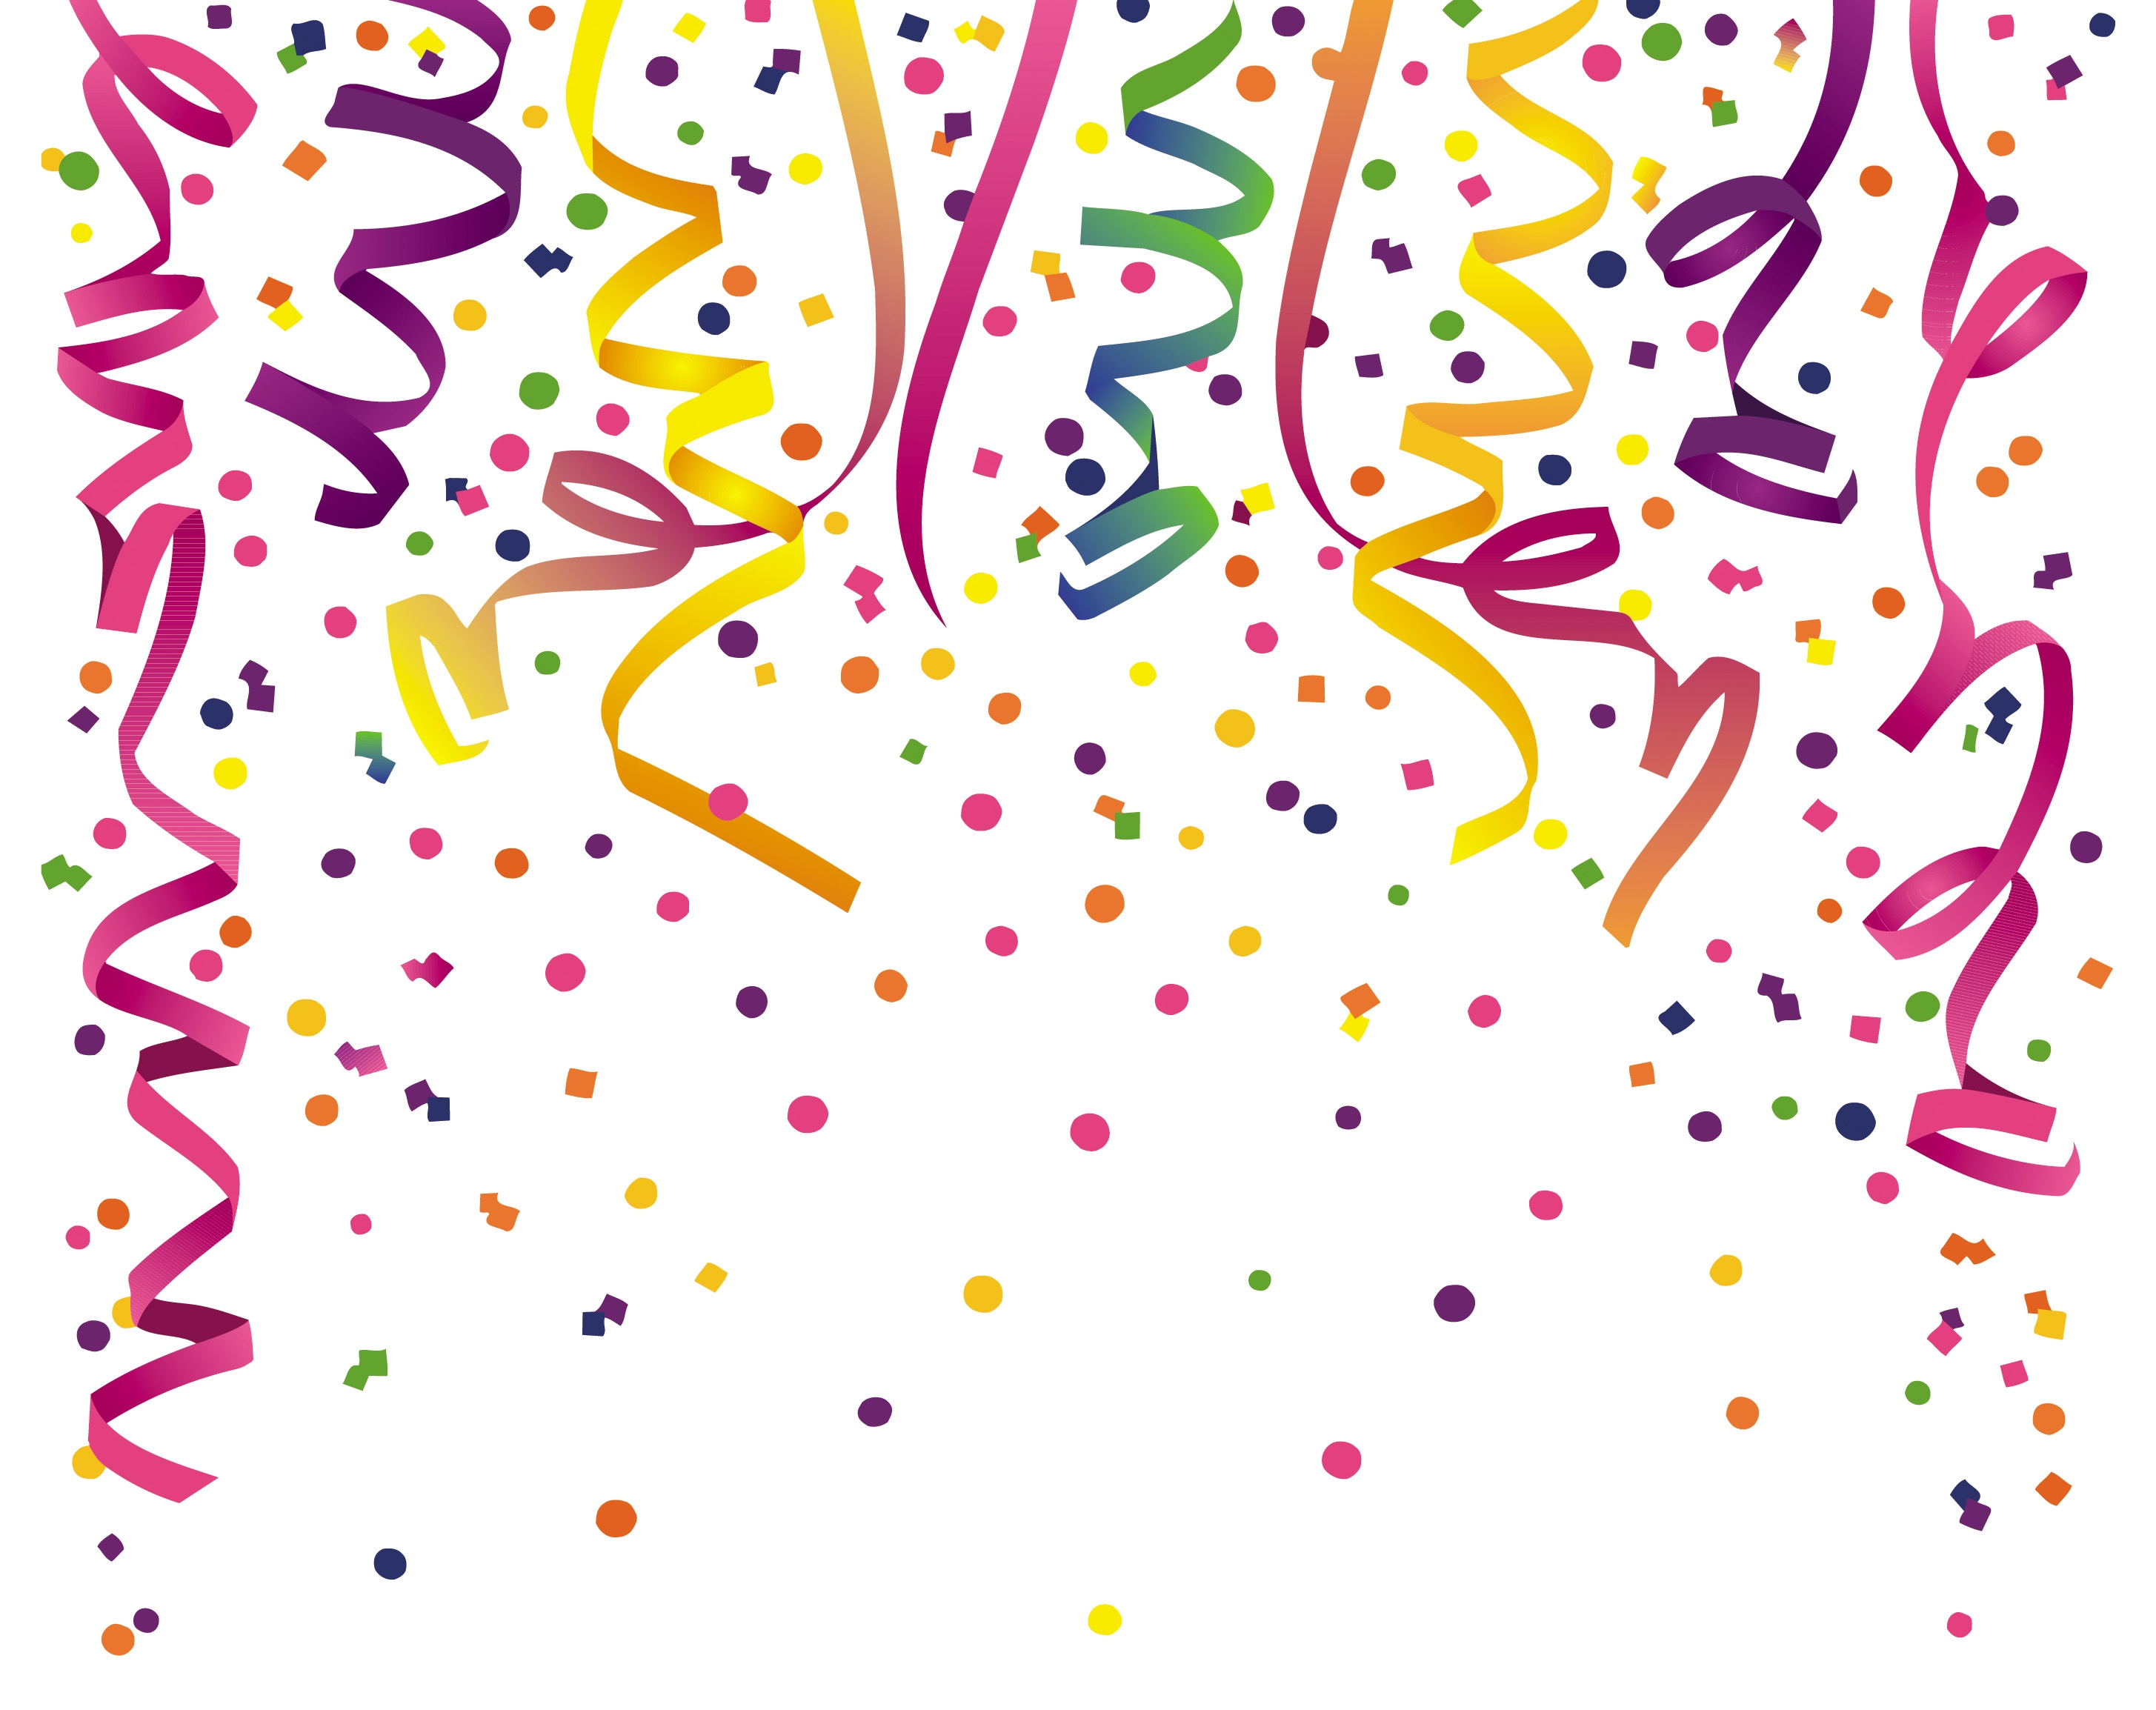 confetti clipart - 1 - o - Best Confetti-confetti clipart - 1 - o - Best Confetti Clipart Clipartion-1